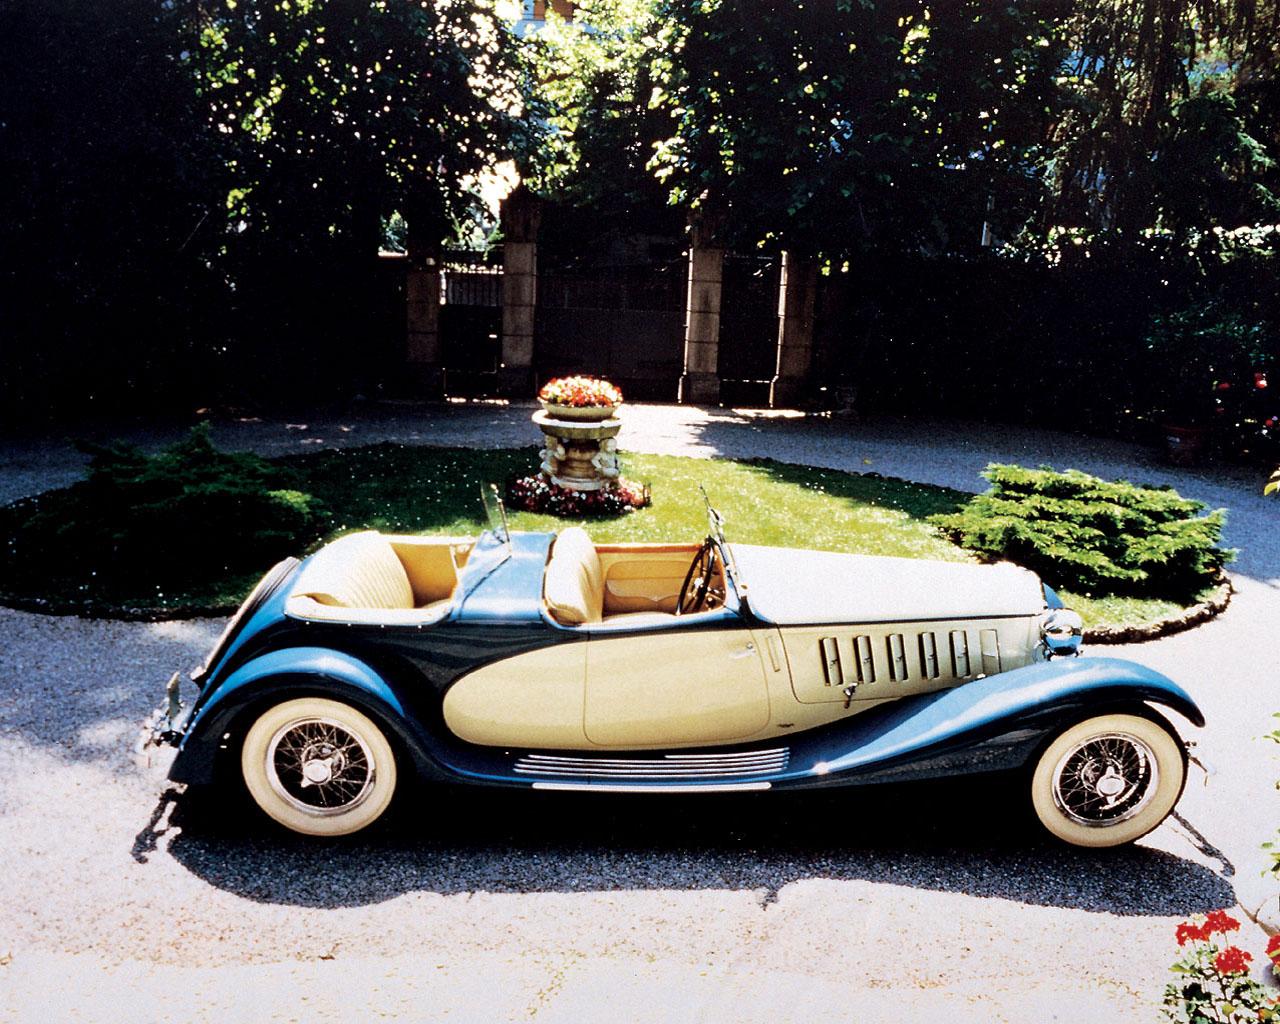 http://www.carstyling.ru/resources/studios/1933-Castagna-Lancia-Astura-Series-I-Dual-Cowl-Sport-Phaeton-02.jpg